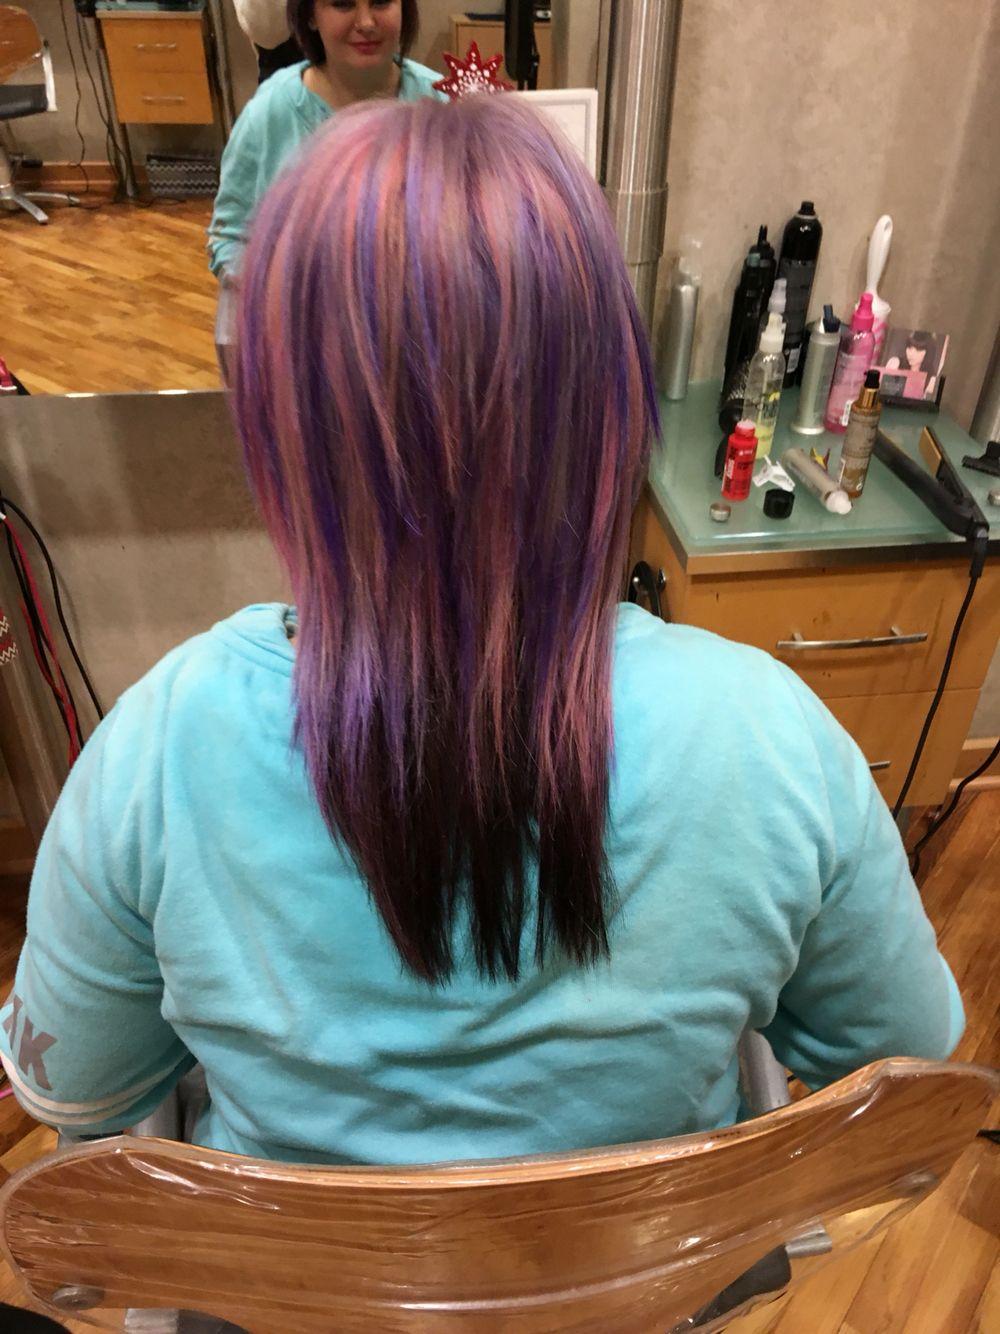 Pastel Colors With A Dark Rich Brown Underneath Mia Maxx Hair